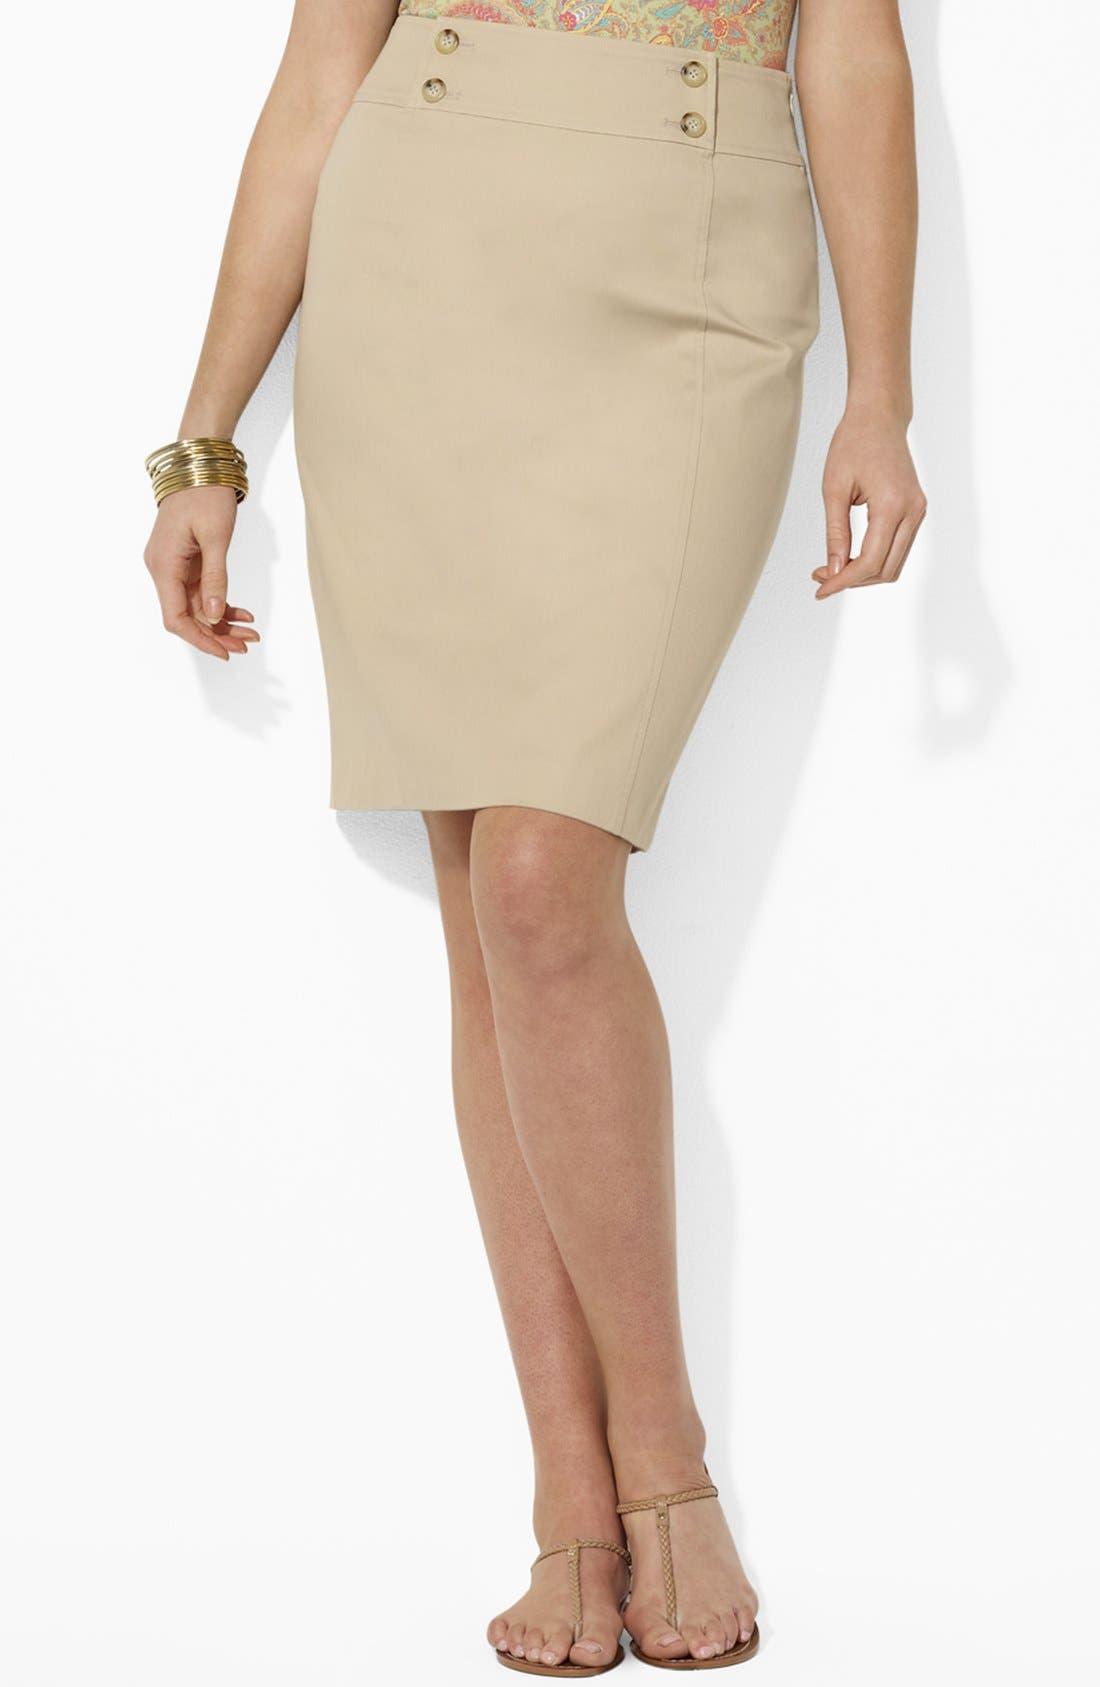 Alternate Image 1 Selected - Lauren Ralph Lauren Button Detail Straight Skirt (Plus Size)